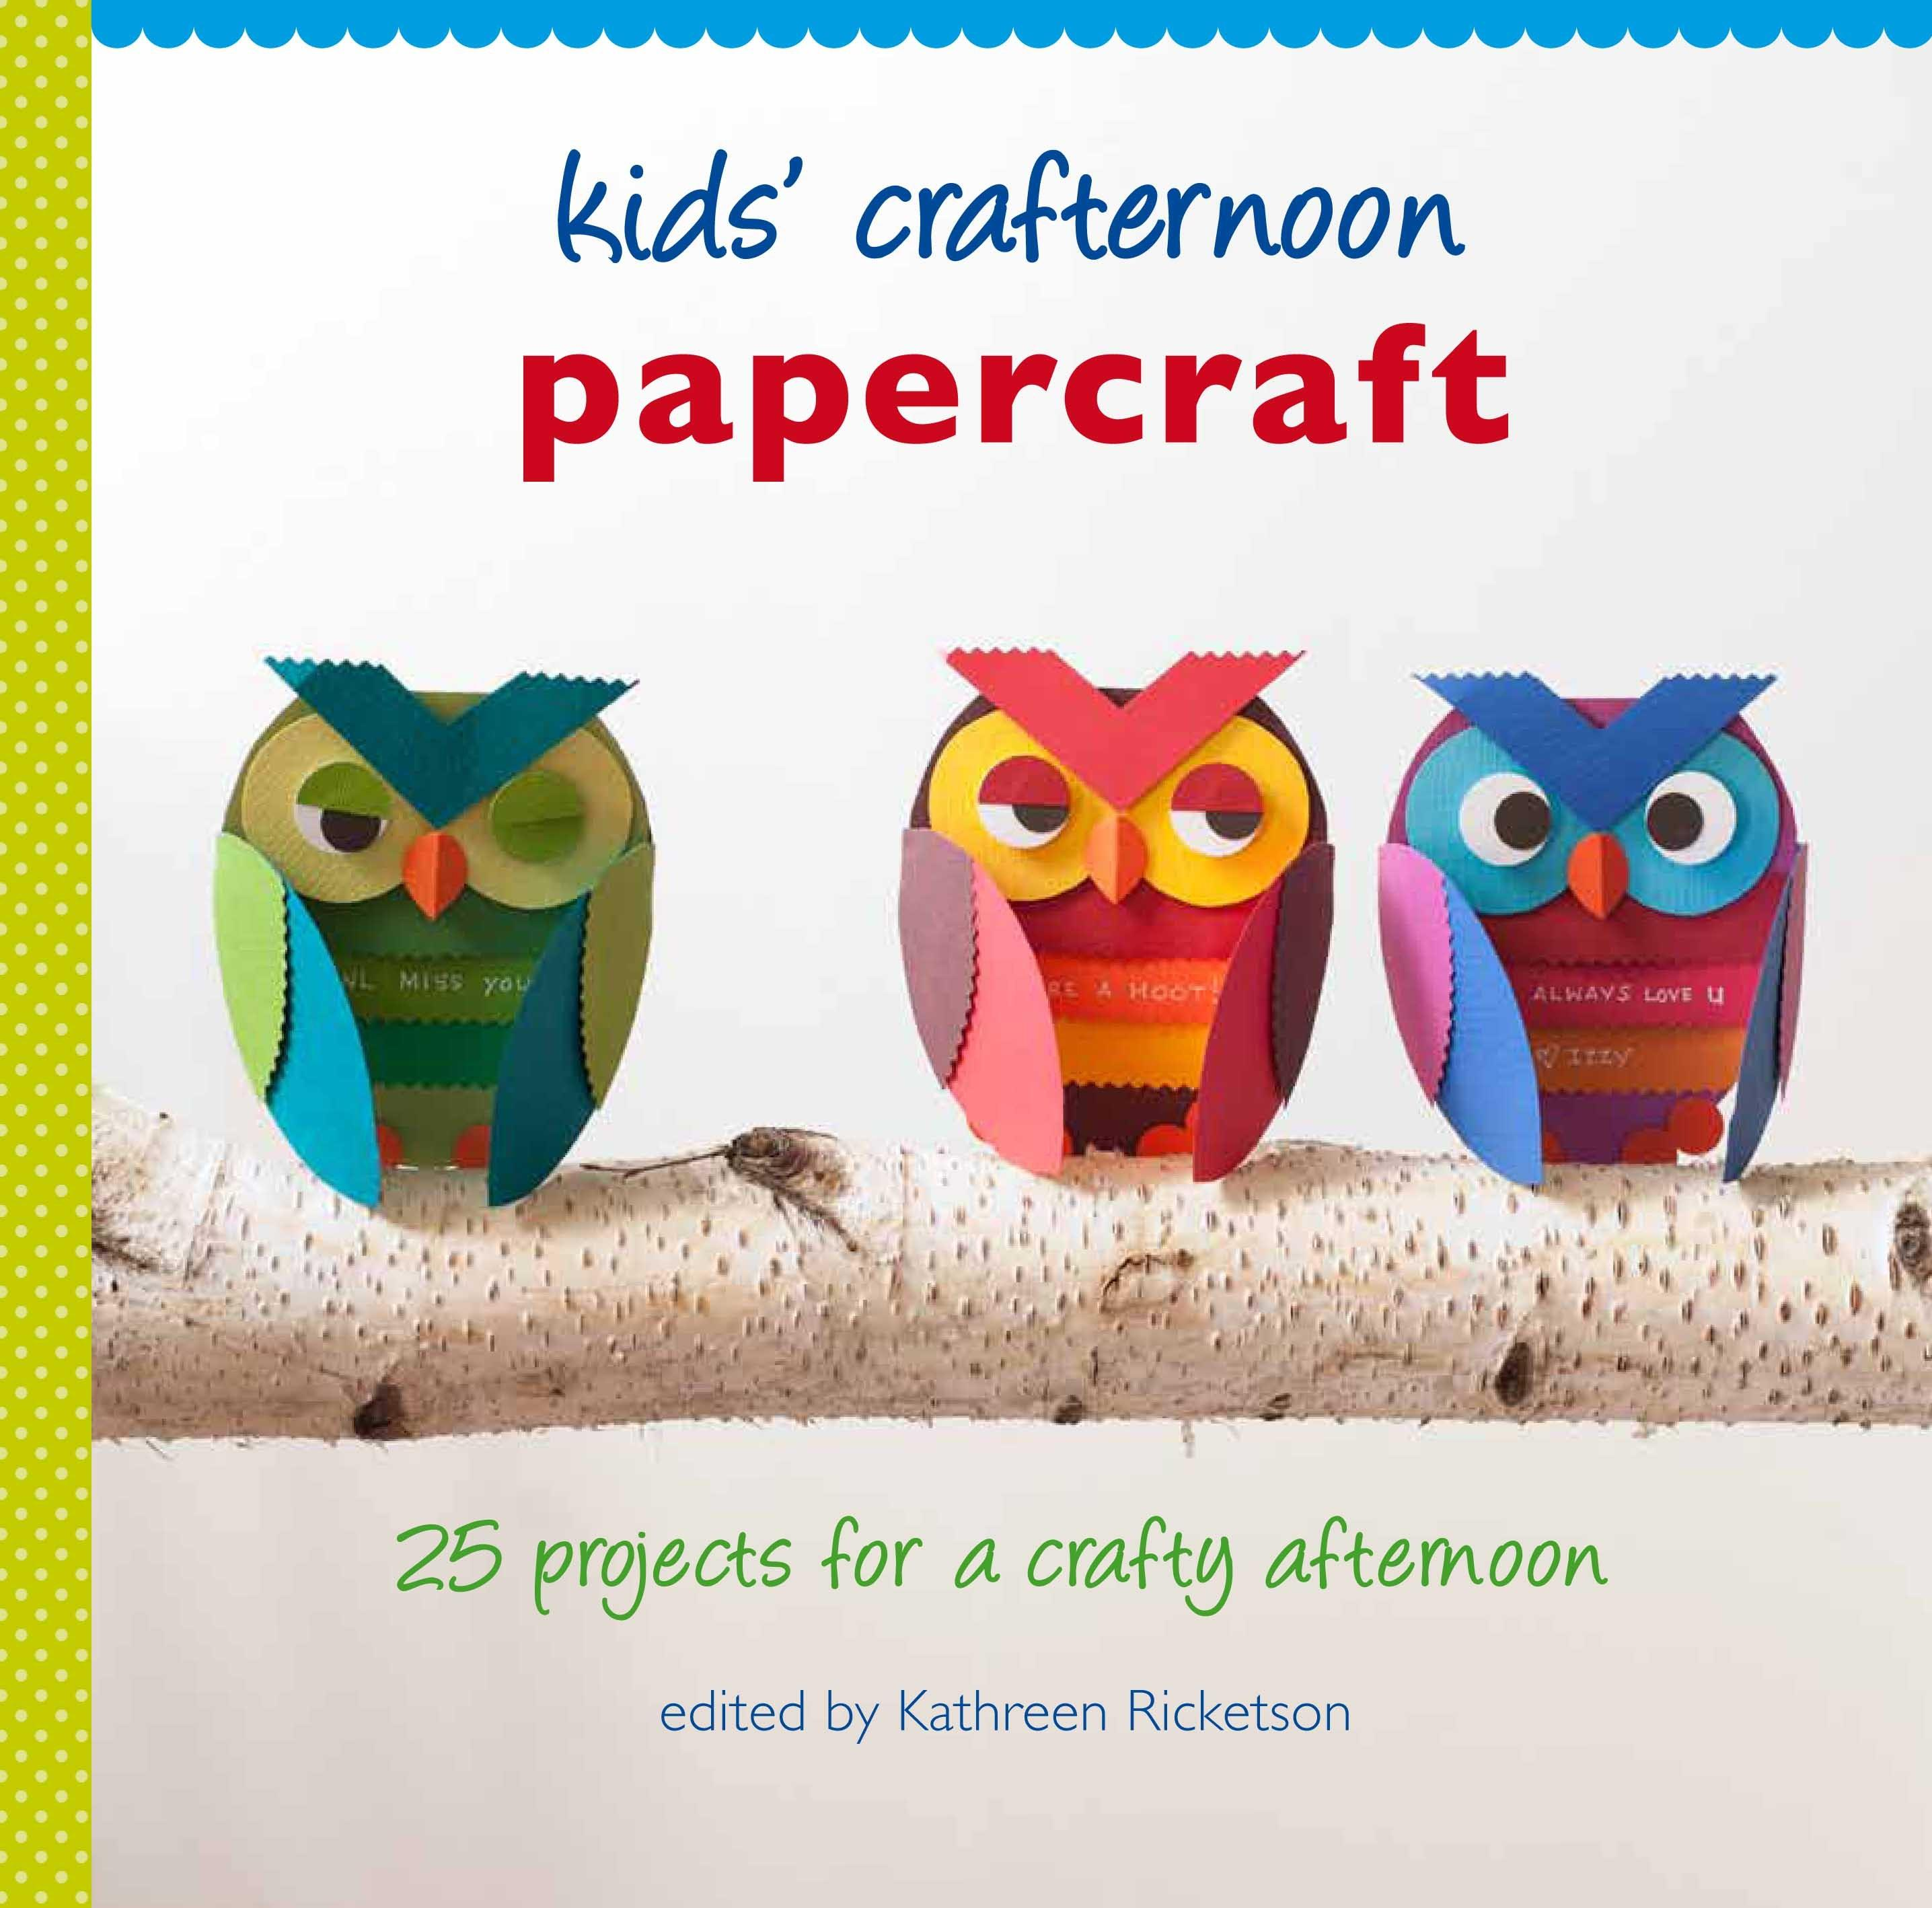 Kids' Crafternoon:Papercraft